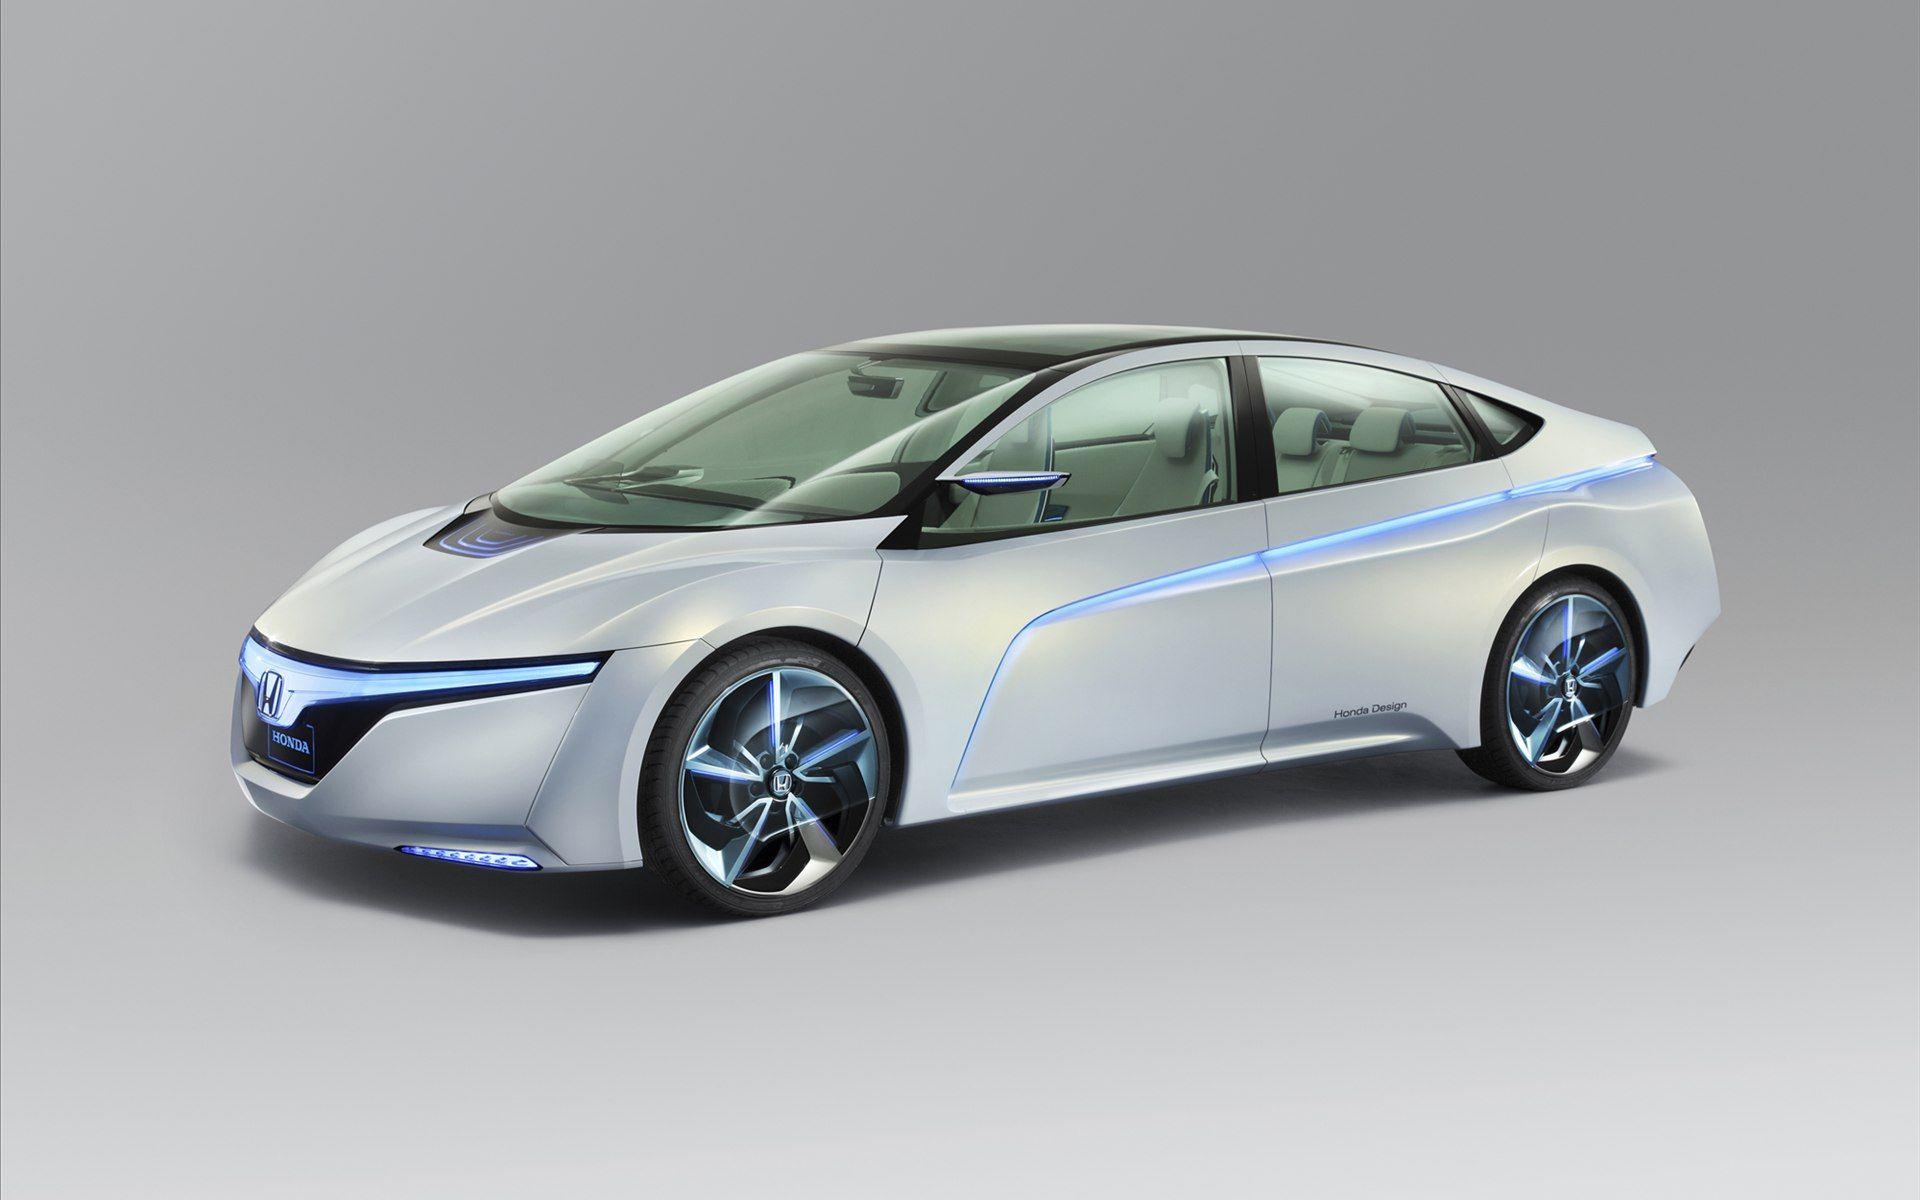 honda concept car tokyo auto show 2011 wallpaper